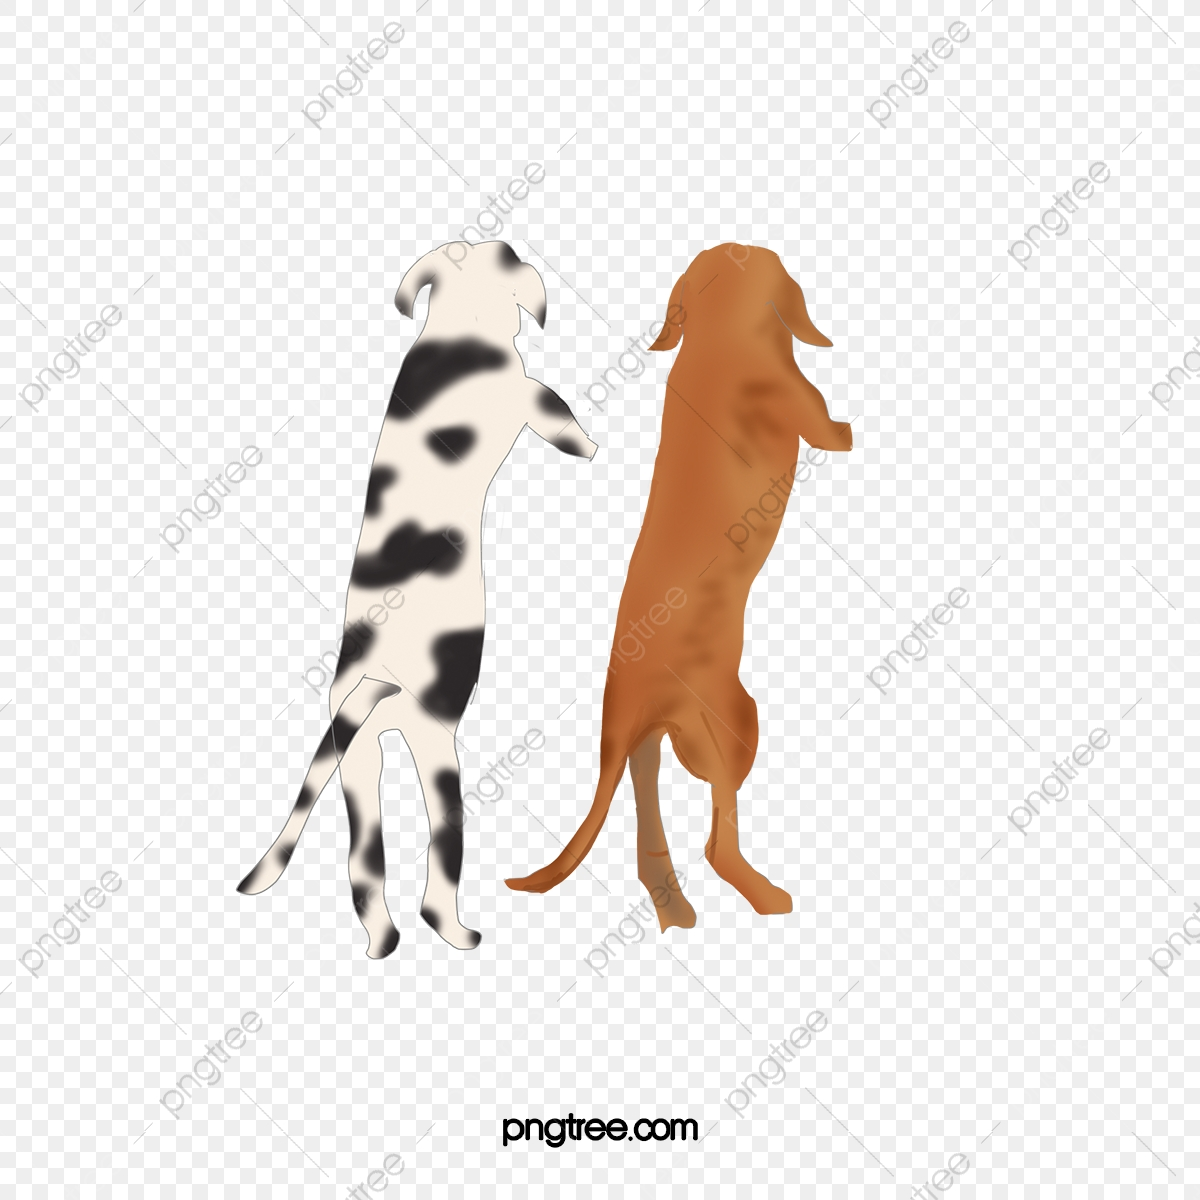 Cartoon Animal Dog Back Pet Cartoon Animal Dog Png Transparent Clipart Image And Psd File For Free Download